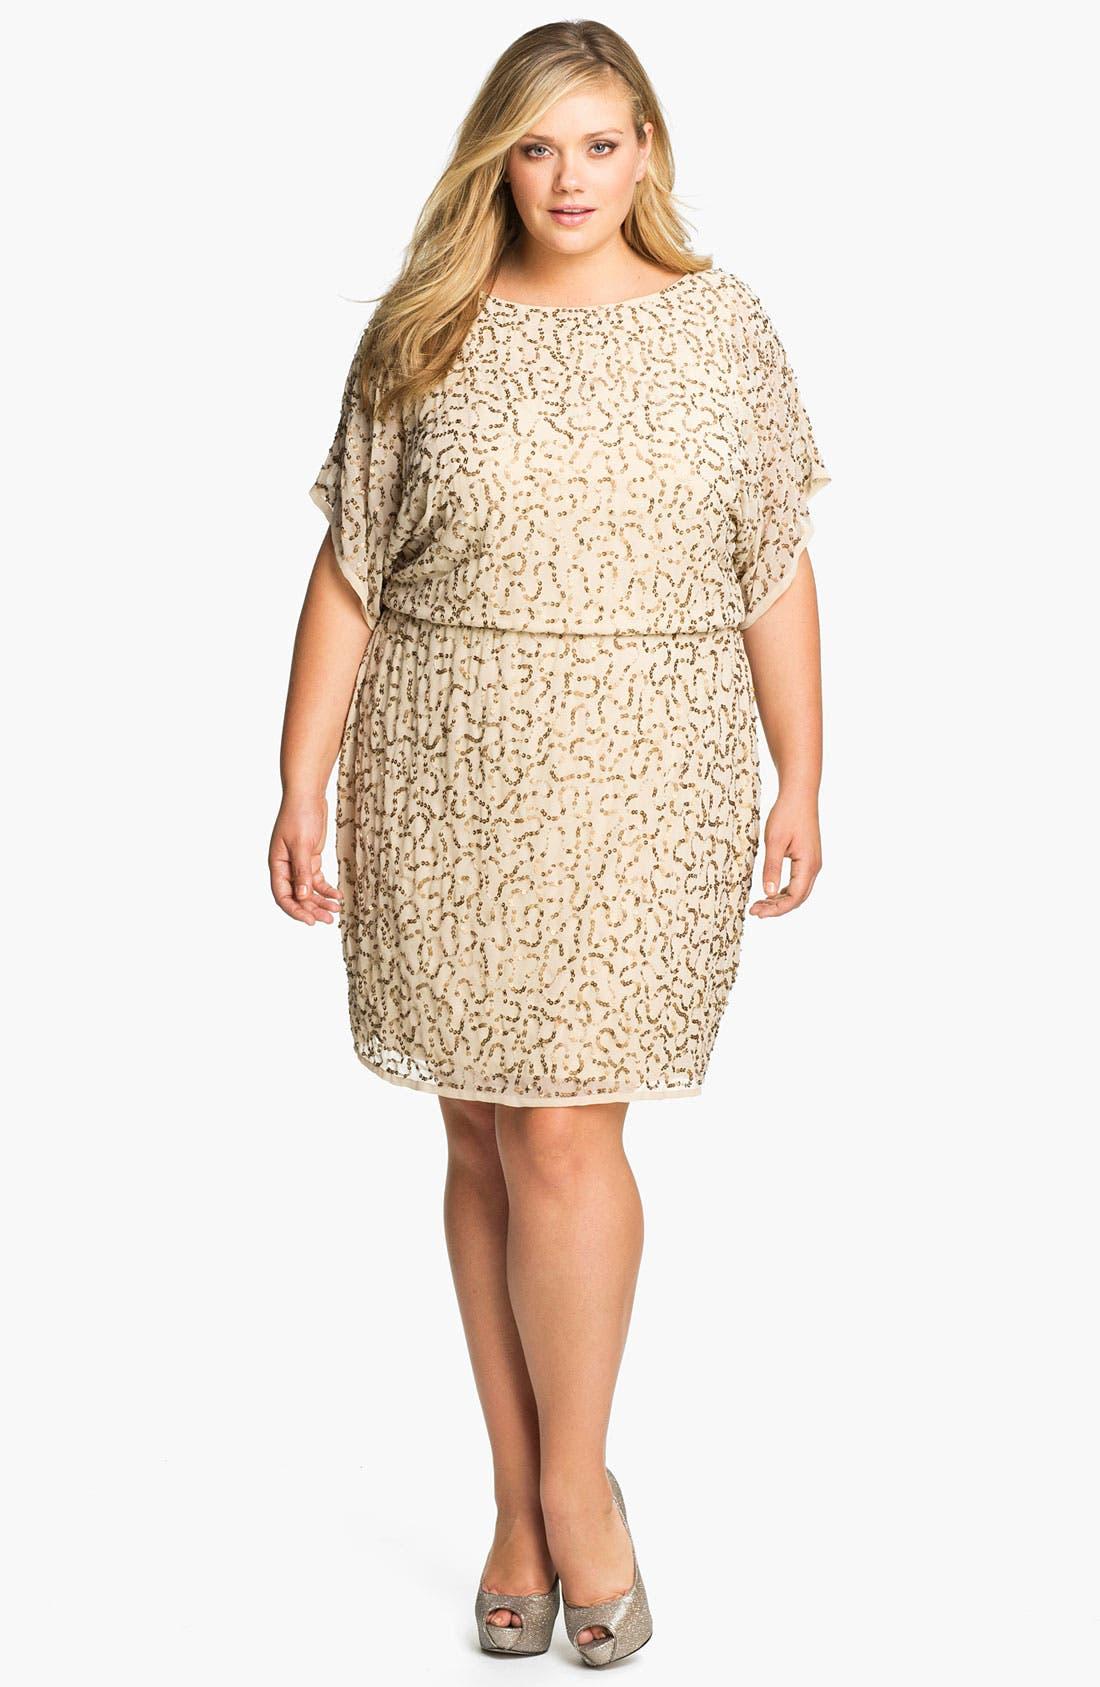 Main Image - Adrianna Papell Sequined Chiffon Blouson Dress (Plus)